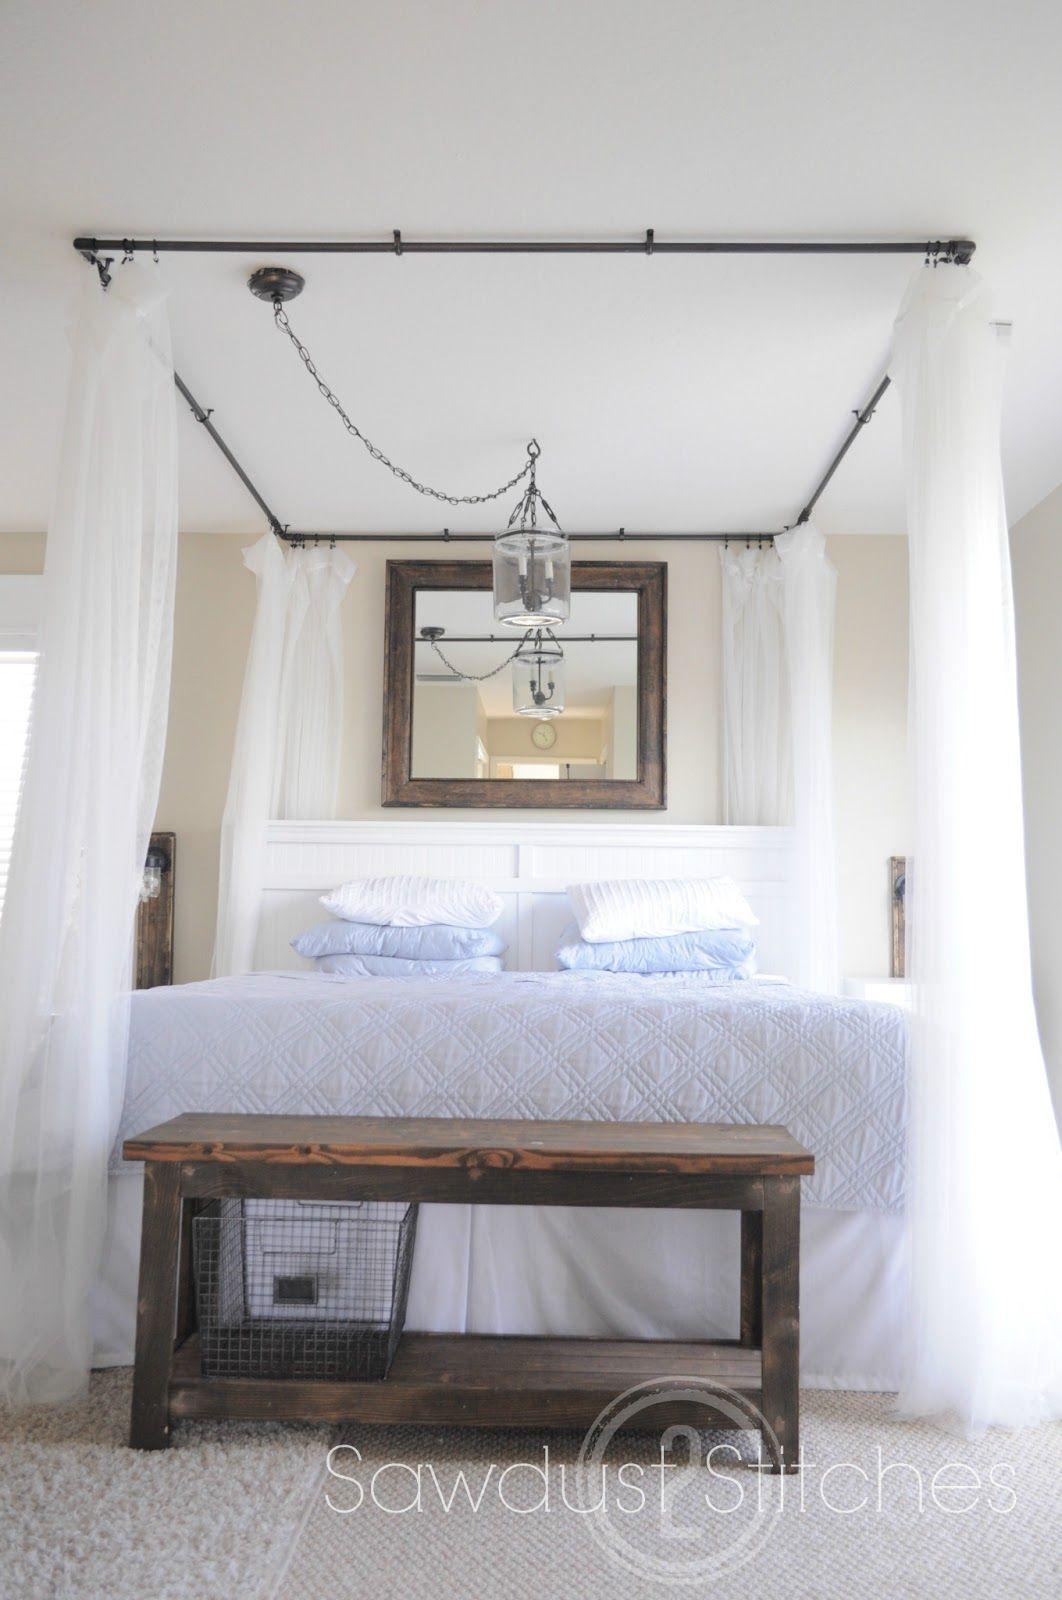 Cortinas cama deco habitaci n pinterest hogar recamara y decoraci n hogar - Cortinas para cama ...